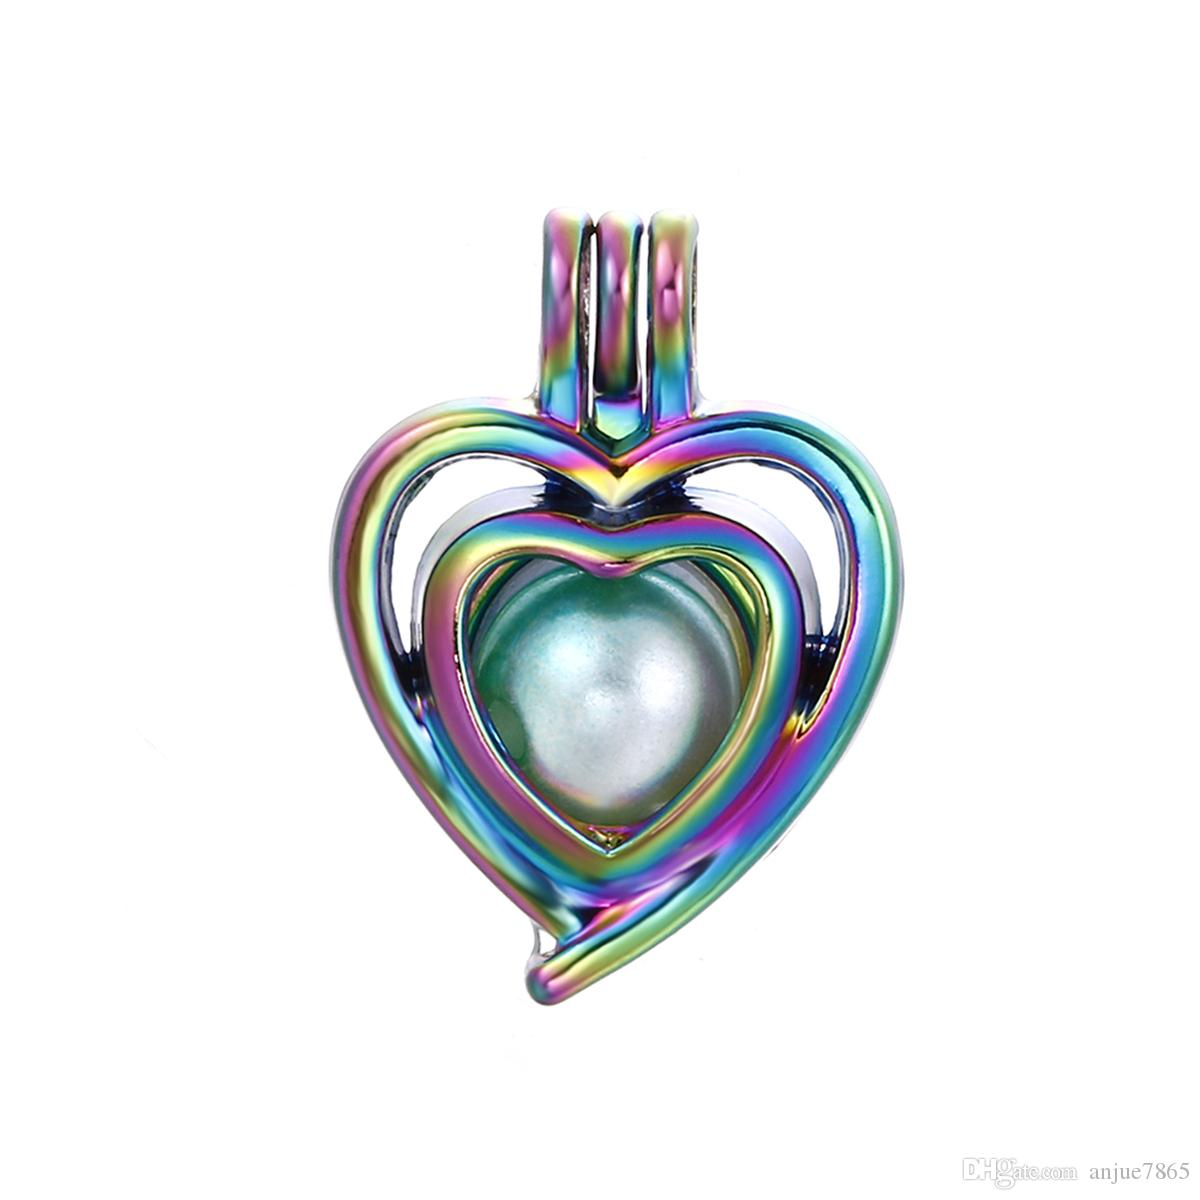 Charm Alloy Unicorn Heart Pendant DIY Necklace Jewelry Making Gift 1pc//10pcs